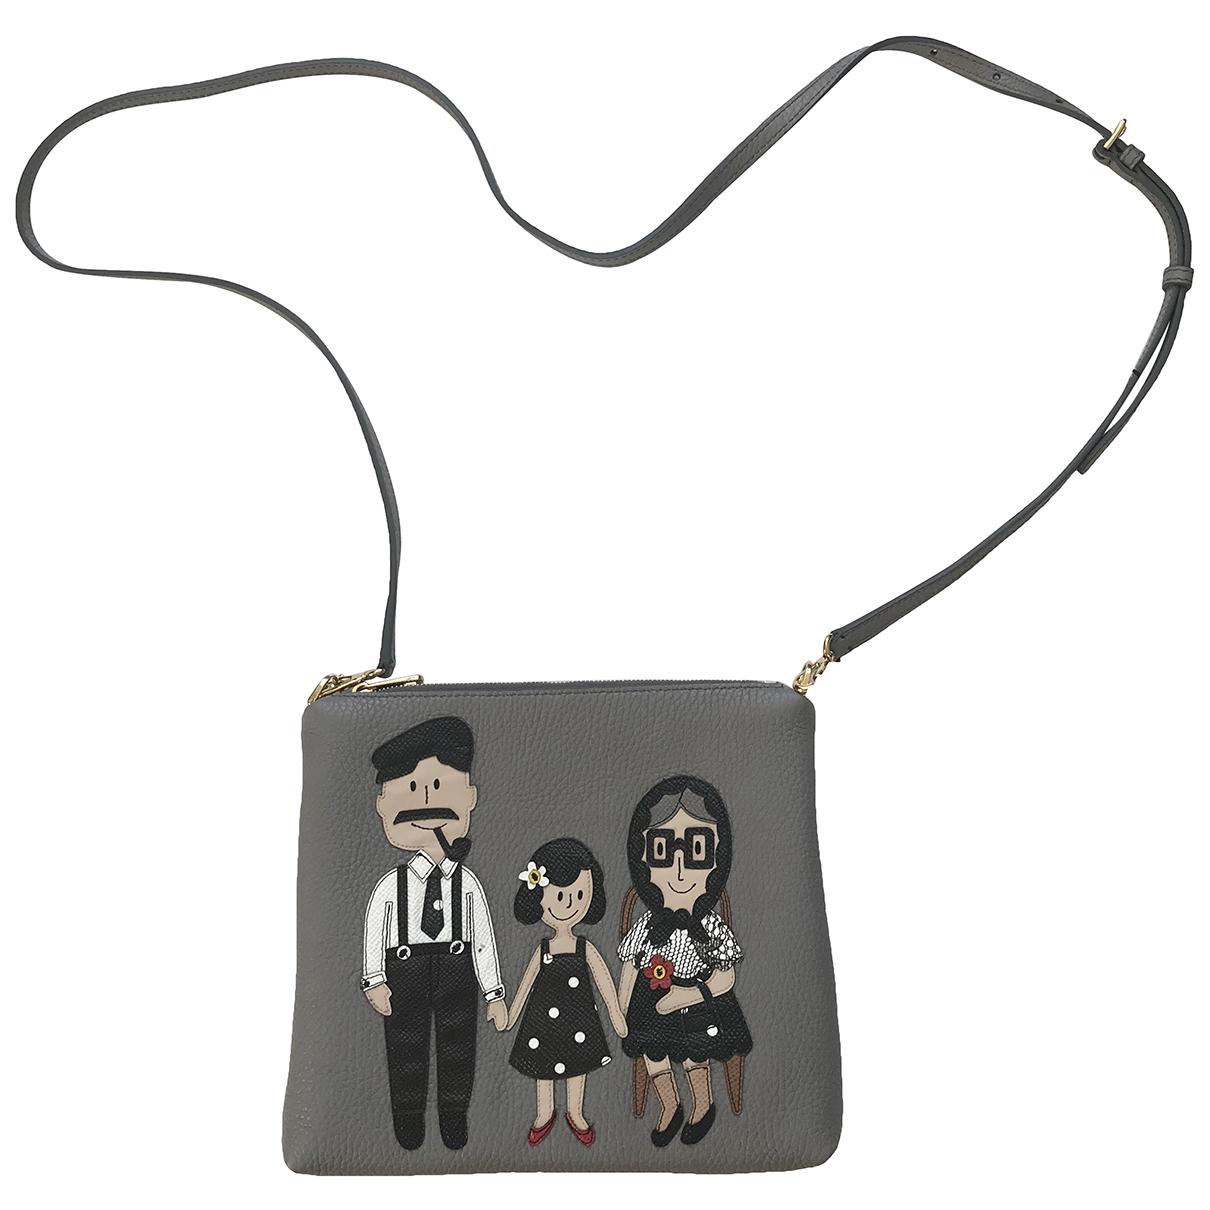 Dolce & Gabbana - Sac a main   pour femme en cuir - gris